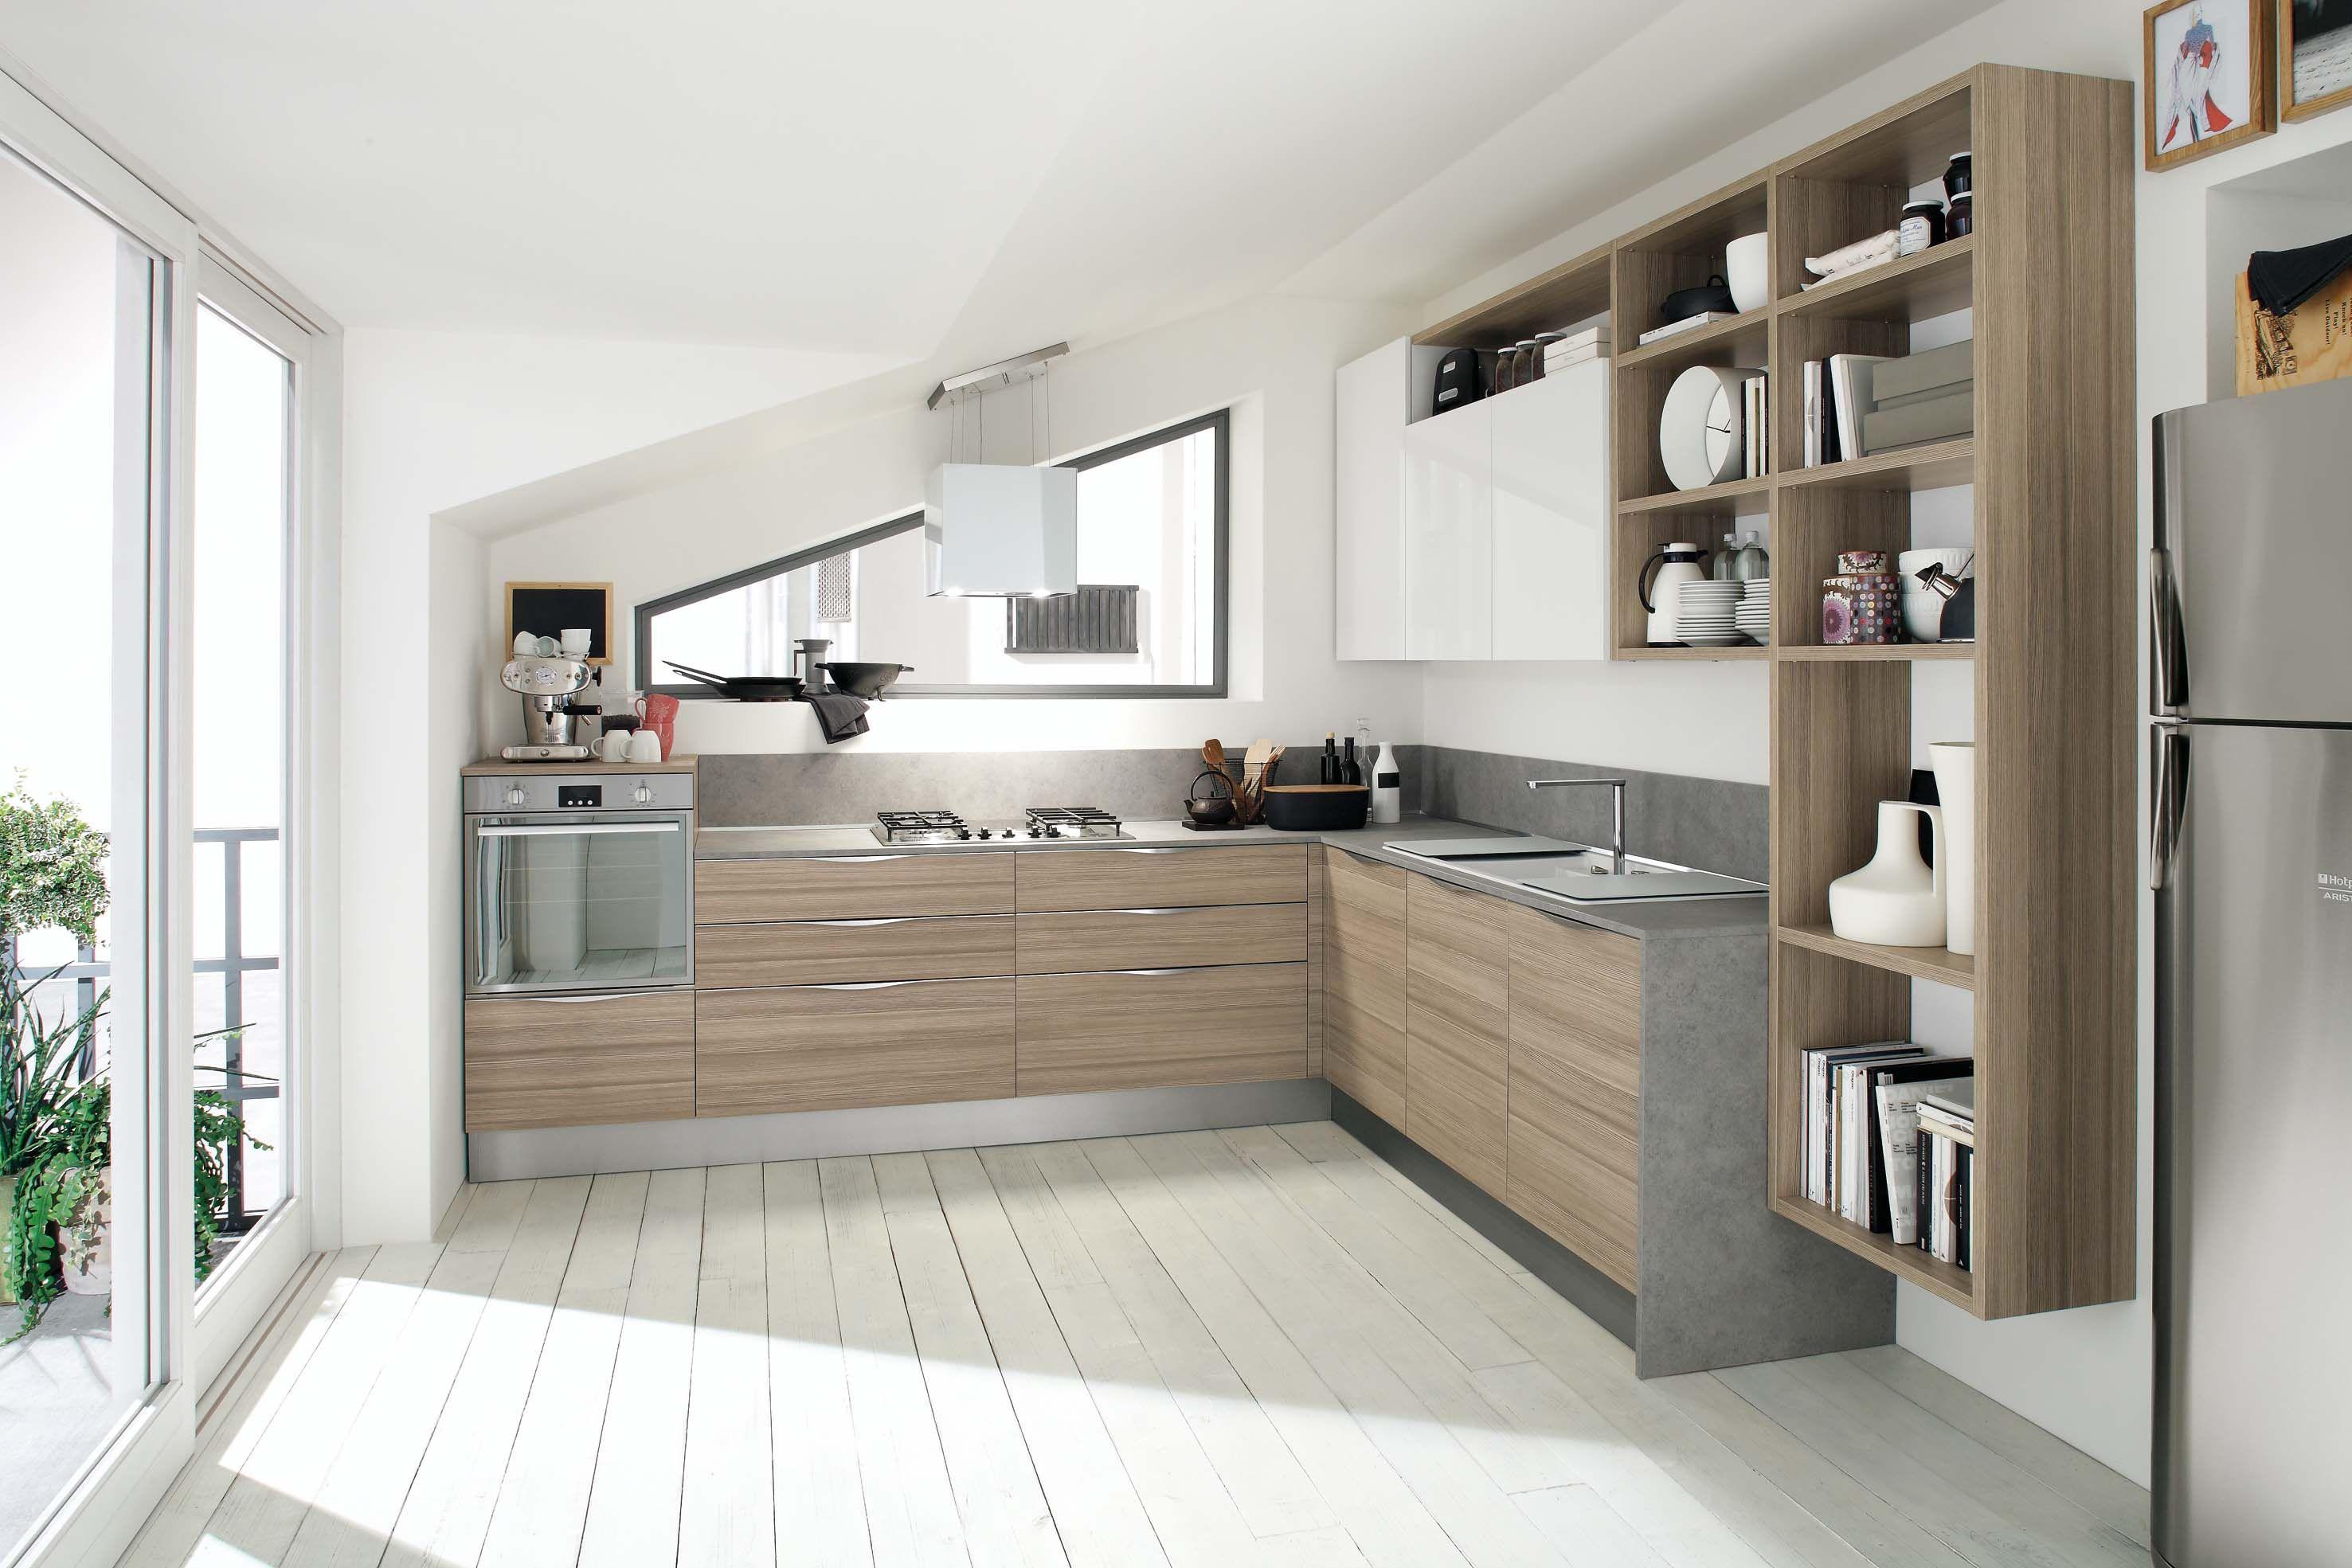 Catalogo Top Veneta Cucine.Veneta Cucine Star Time Home Kitchens Hidden Kitchen Kitchen